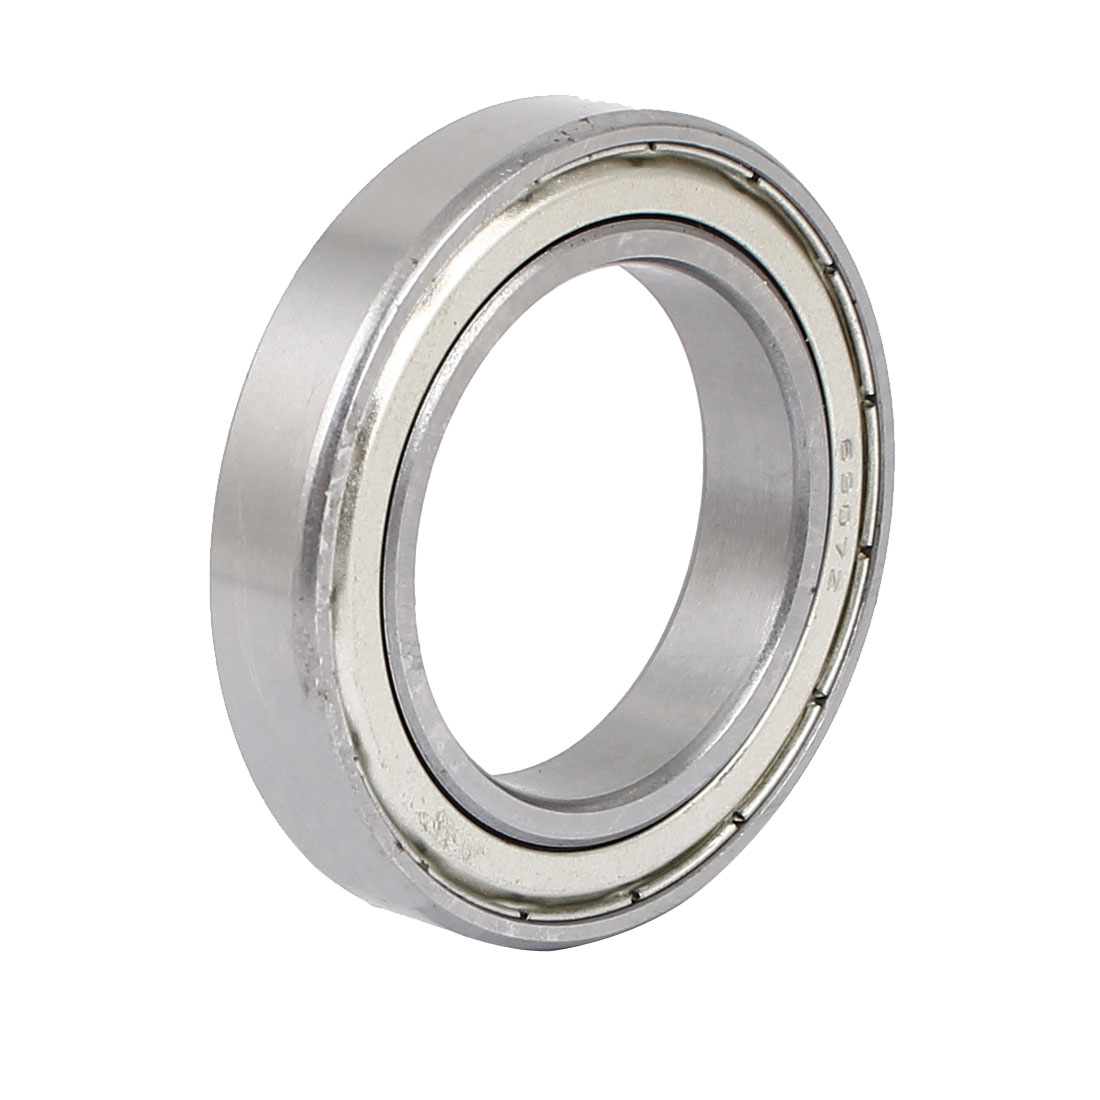 Shielded Mini 69072 Deep Groove Radial Ball Wheel Bearing 55mm x 35mm x 10mm